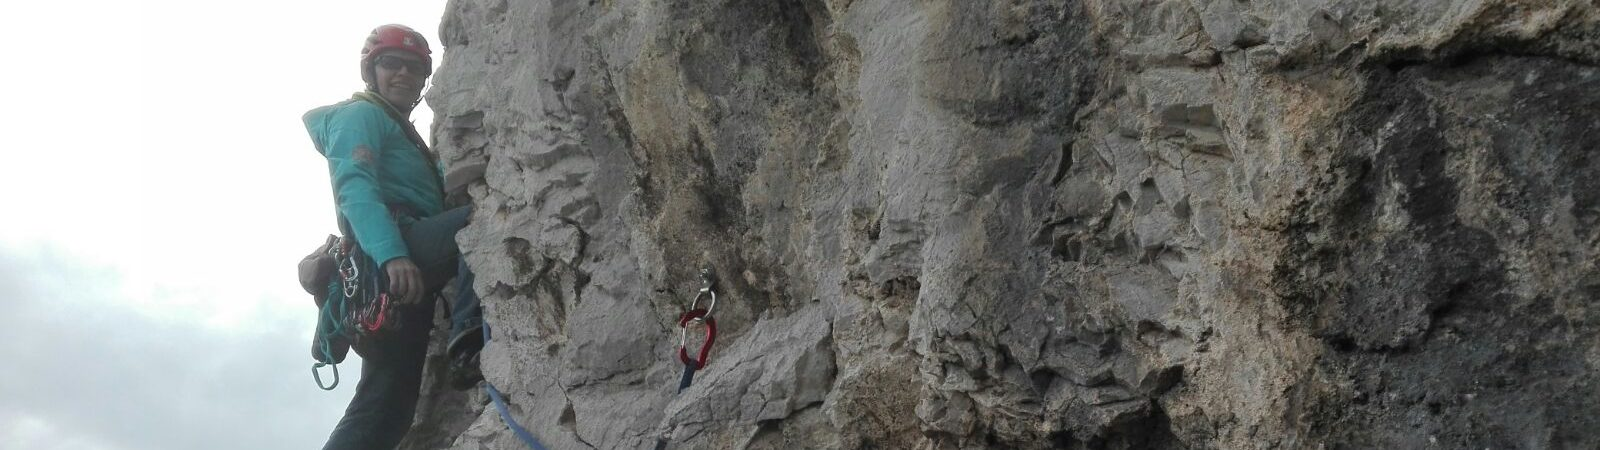 Arco 2-day multi-pitch rock climbing trip, Sarca Valley